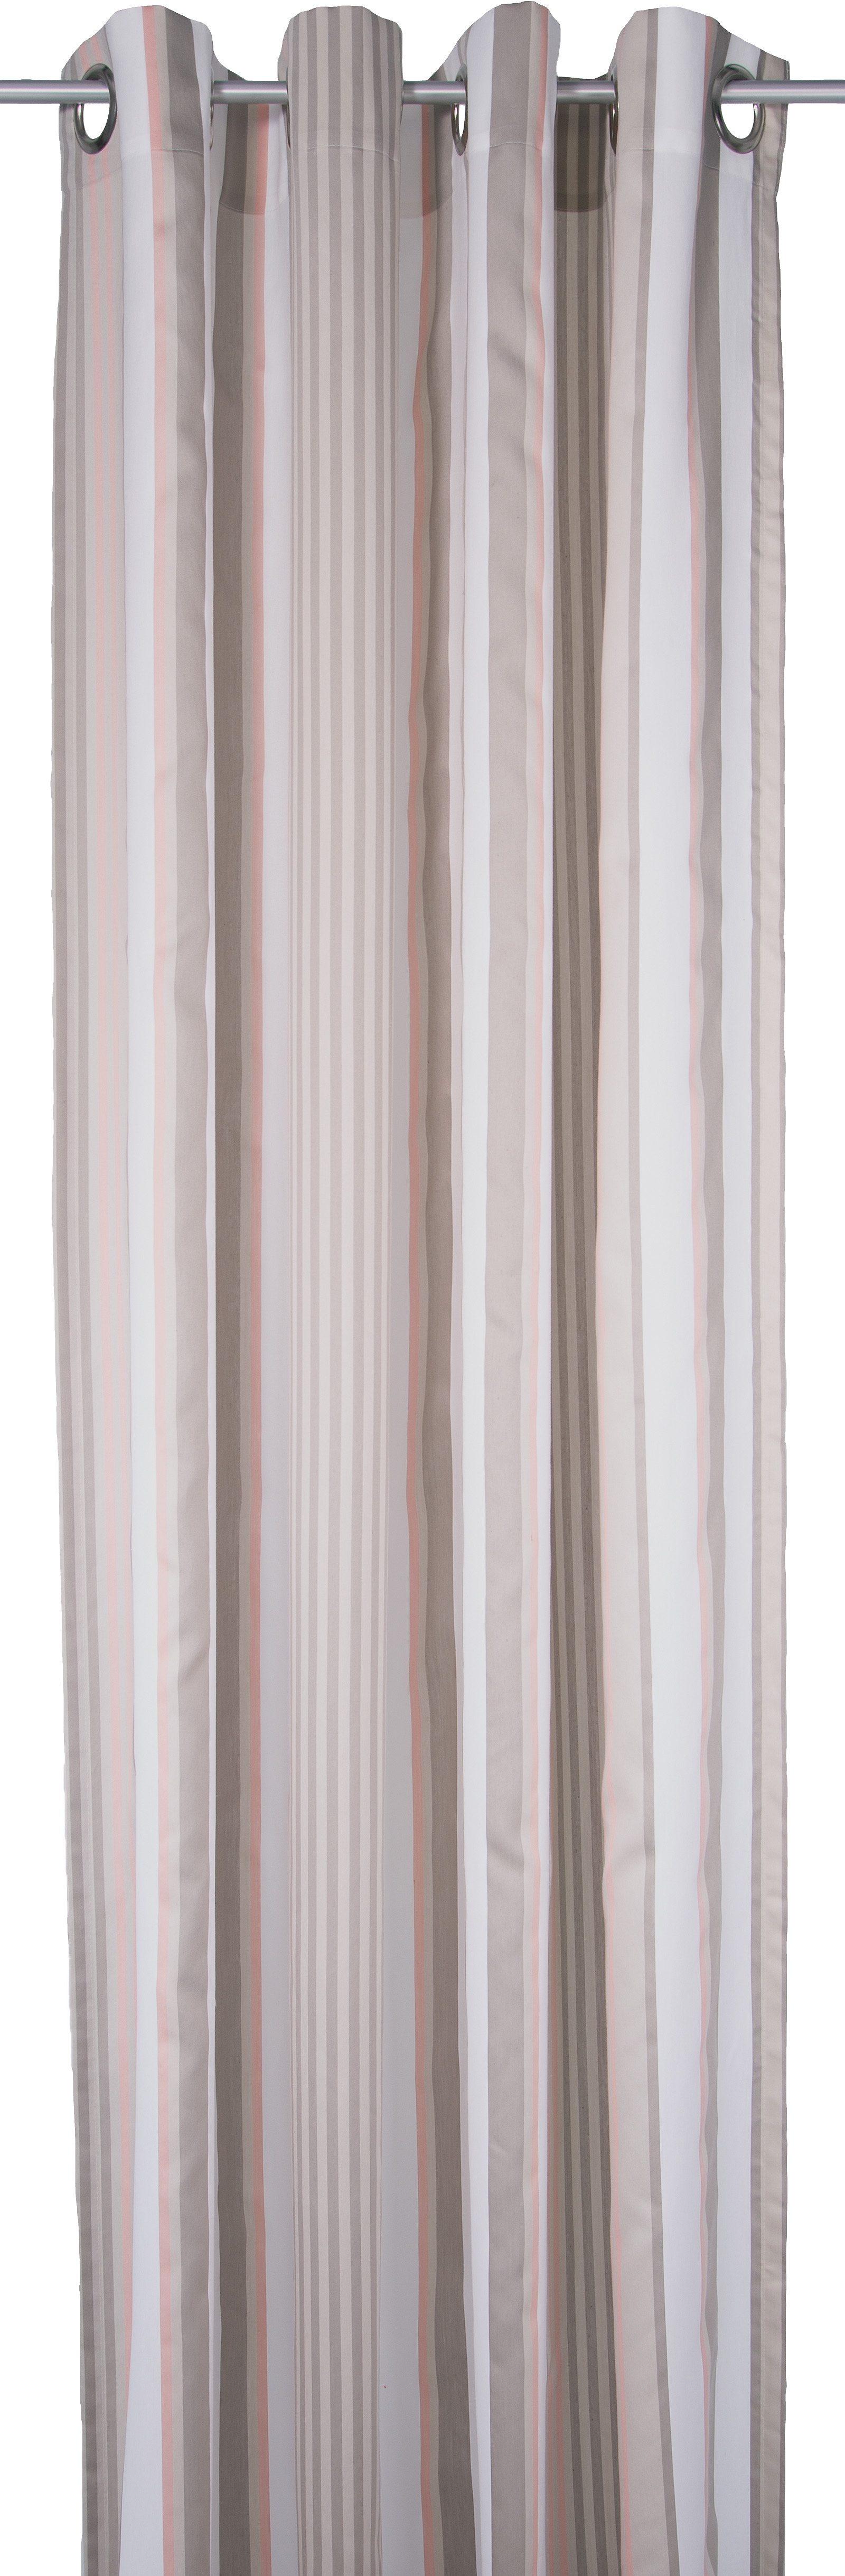 Vorhang, Tom Tailor, »Pastel Stripes«, mit Ösen (1 Stück)